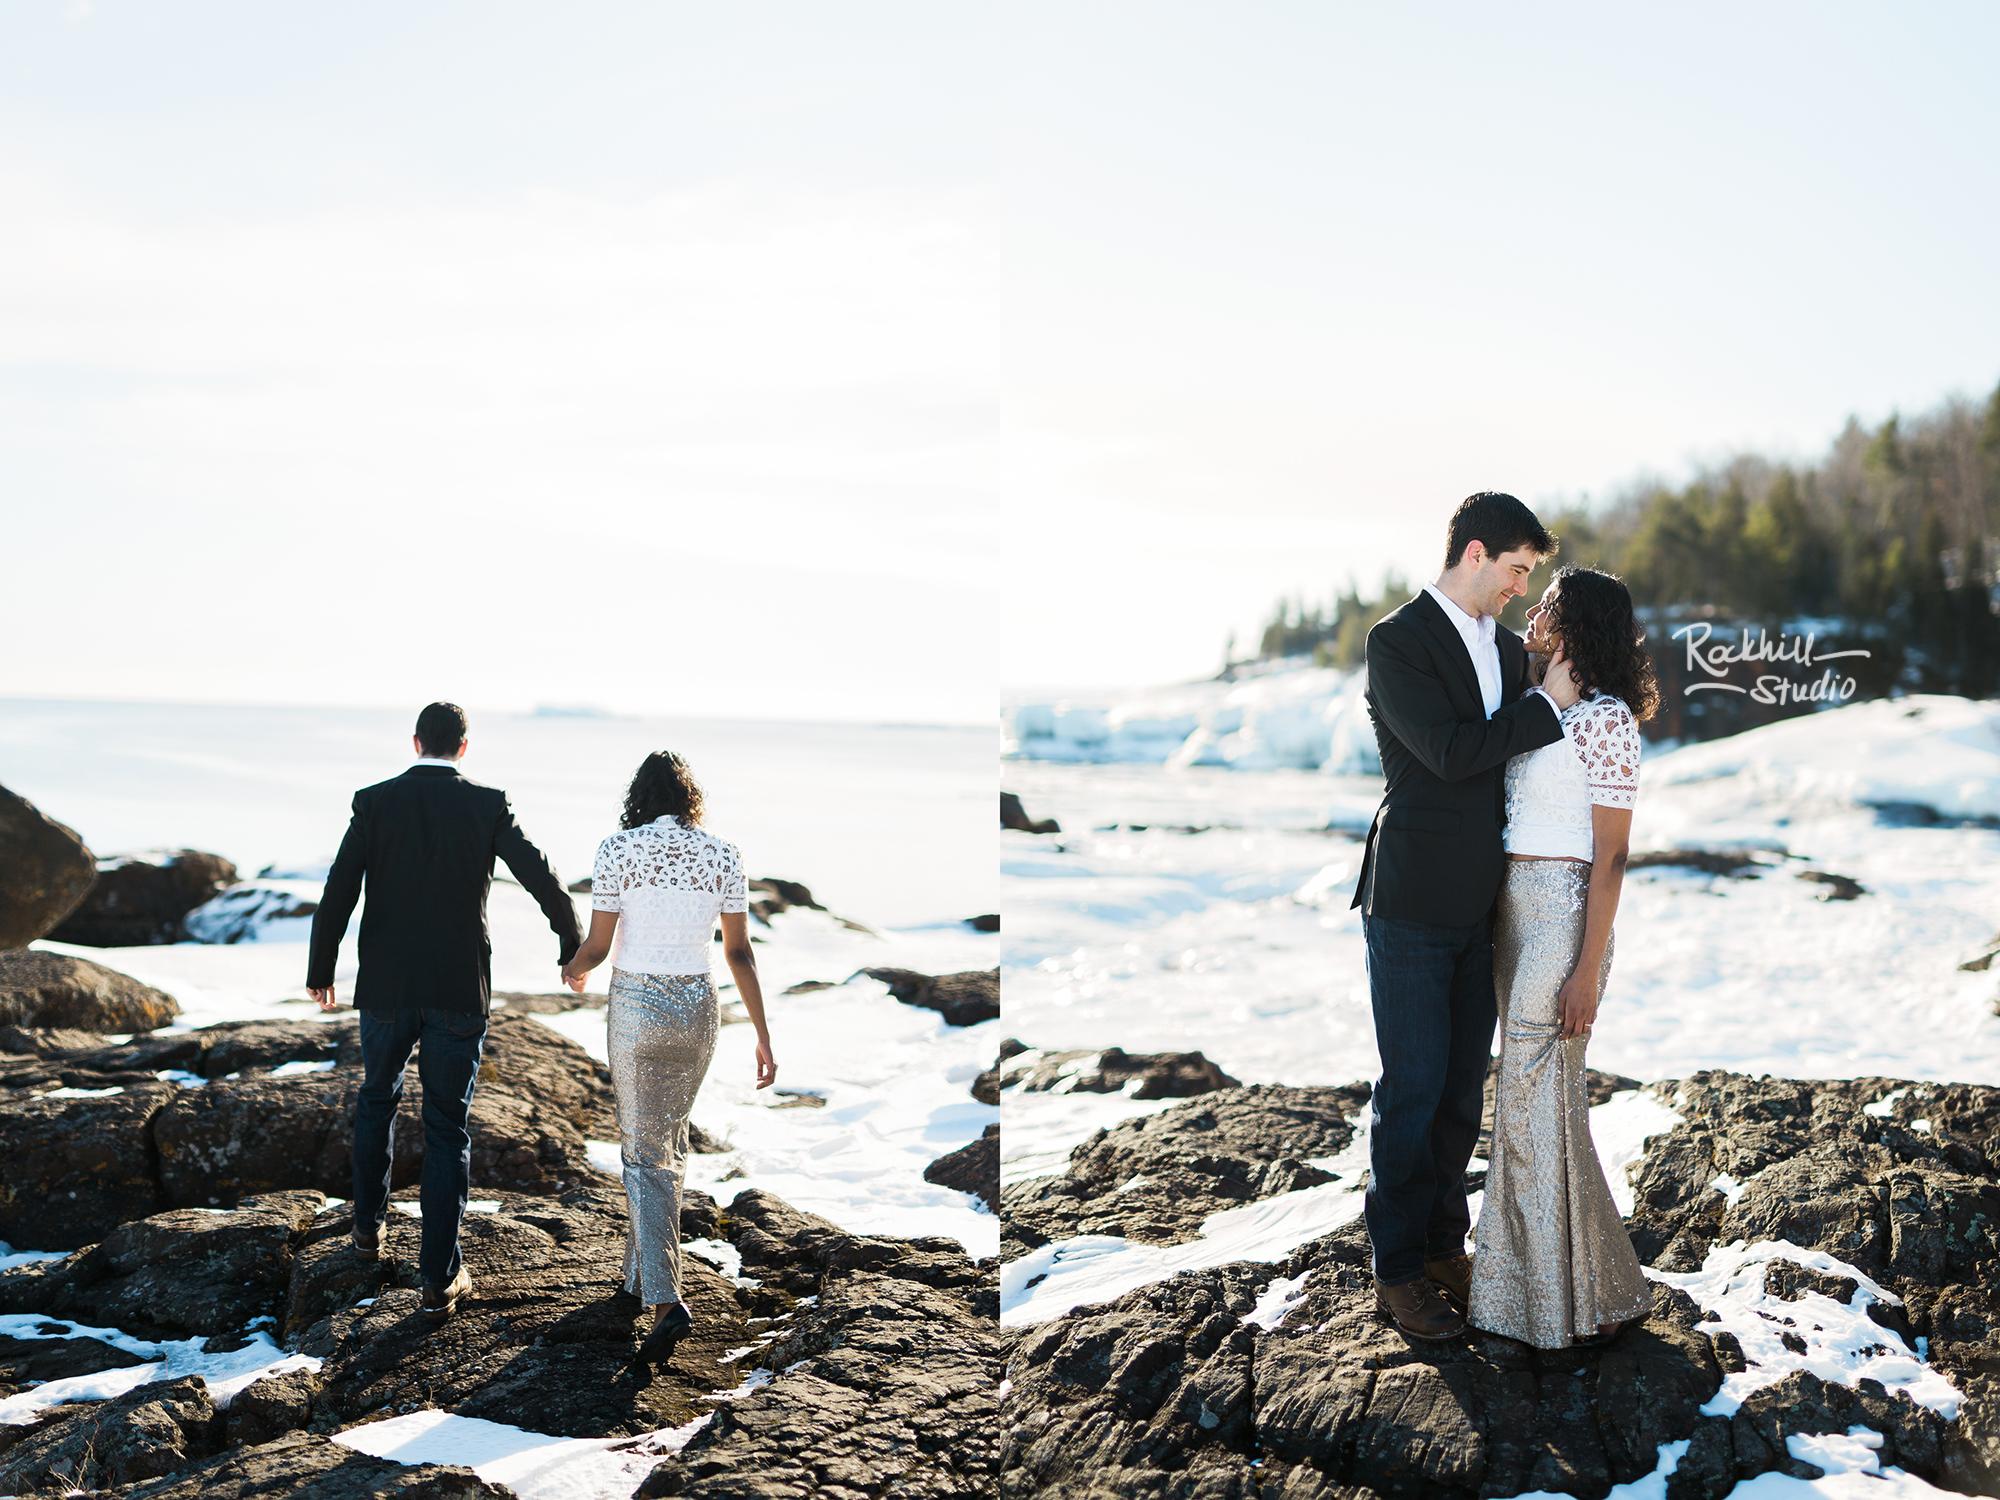 northern-michigan-wedding-marquette-engagement-upper-peninsula-michigan-rockhill-winter-4.jpg